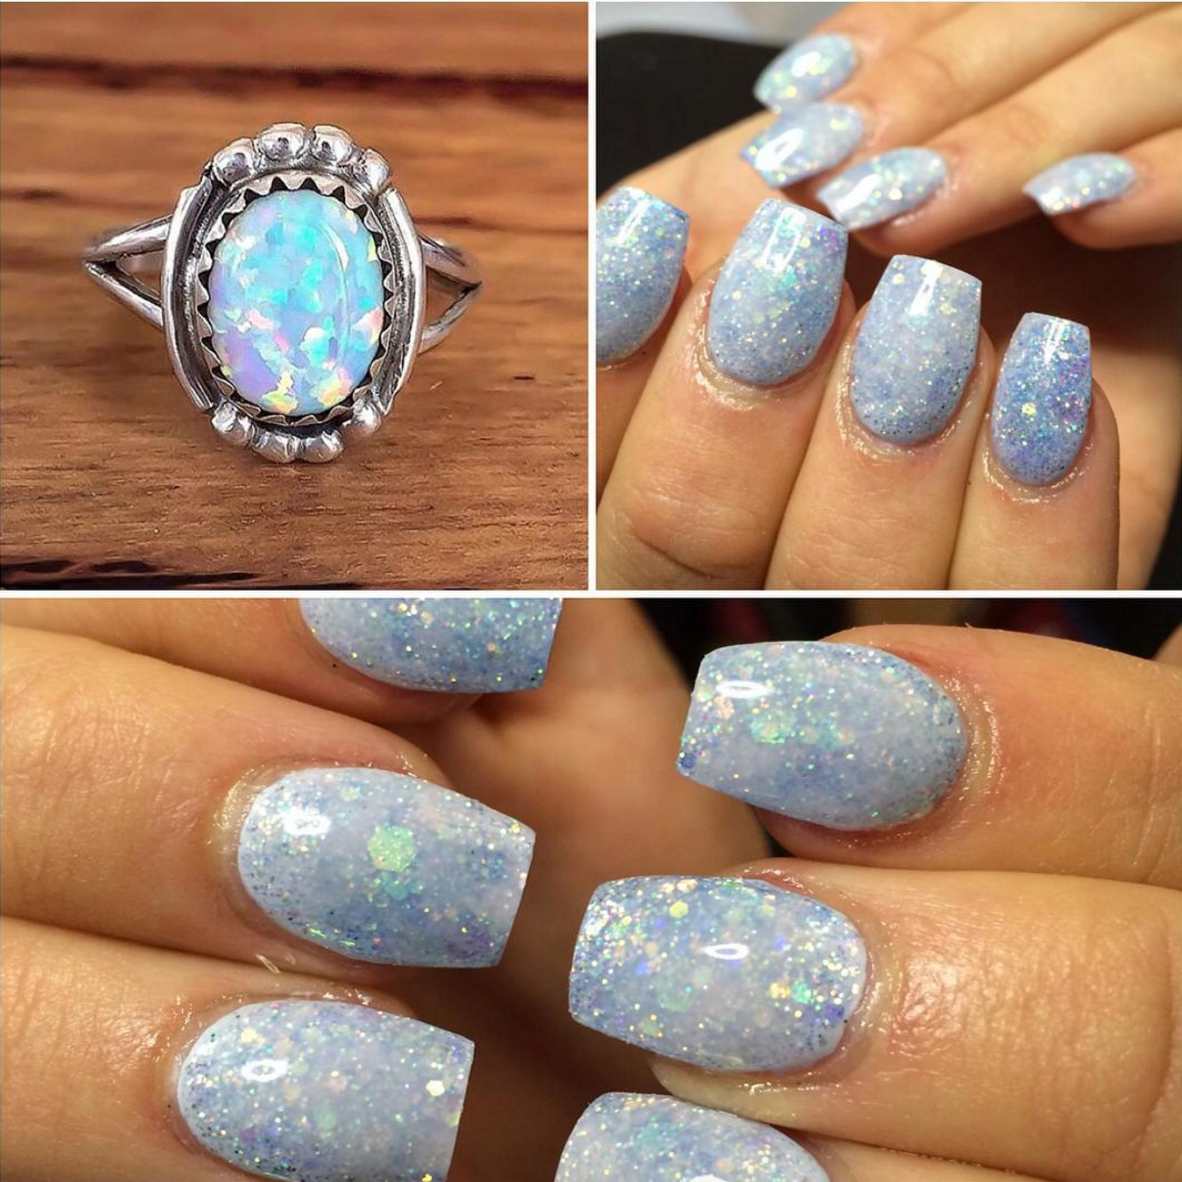 Opal nail polish. Image: handymandy/Instagram